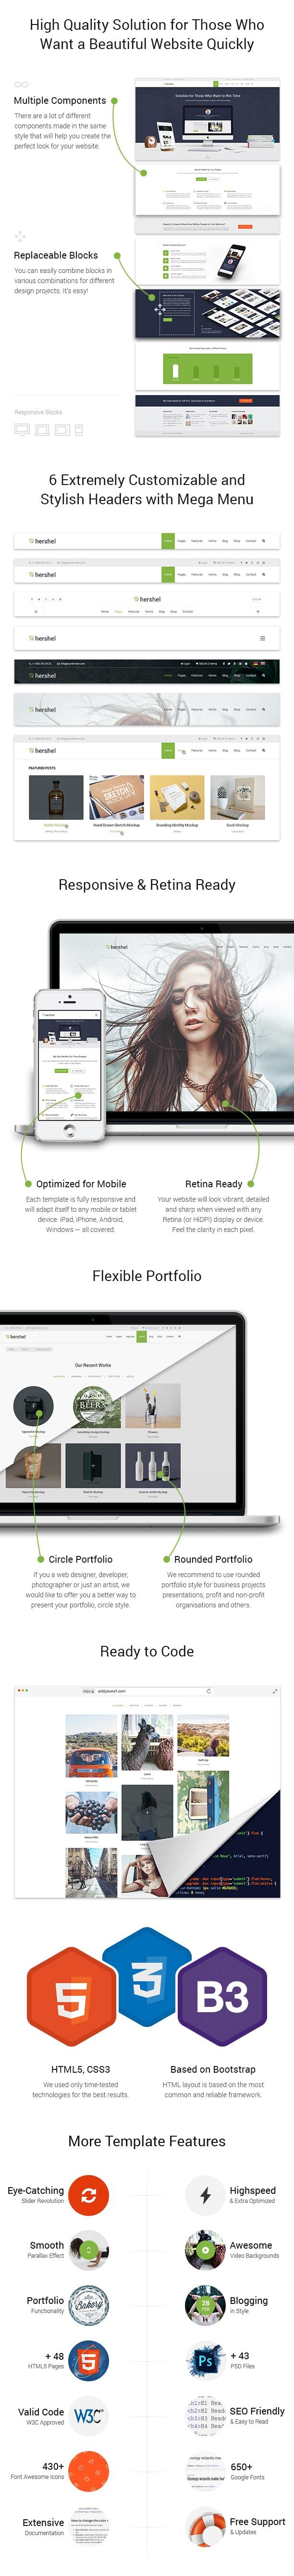 Hershel - Flexible Multipurpose HTML Template - 2